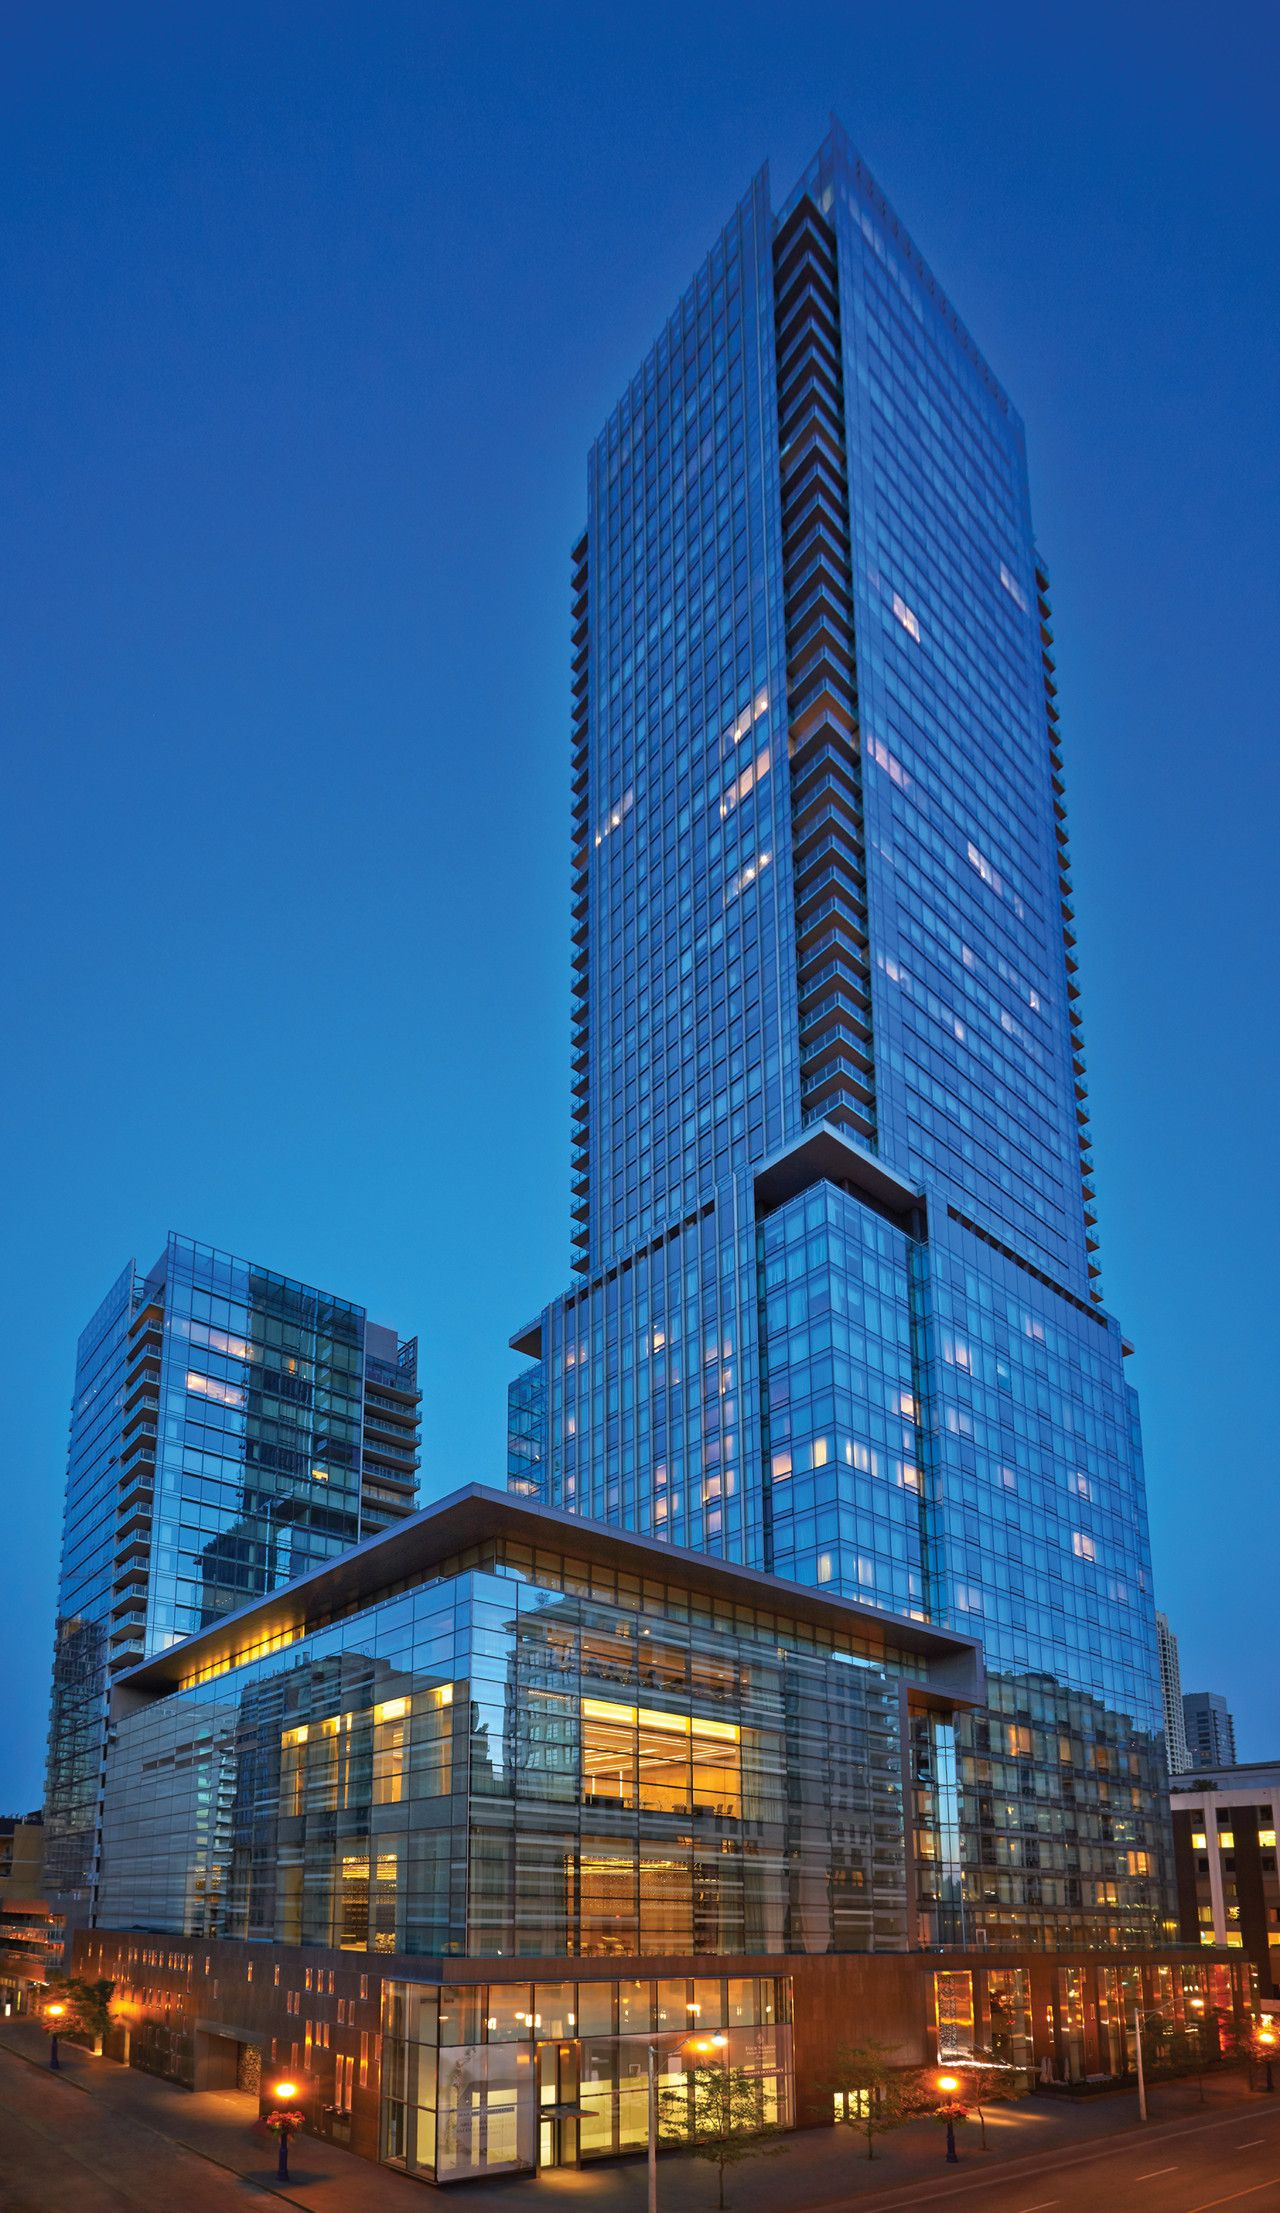 Four Seasons Hotel Toronto Fourseasons Fourseasonstoronto Luxury Luxuryhotel Lobby